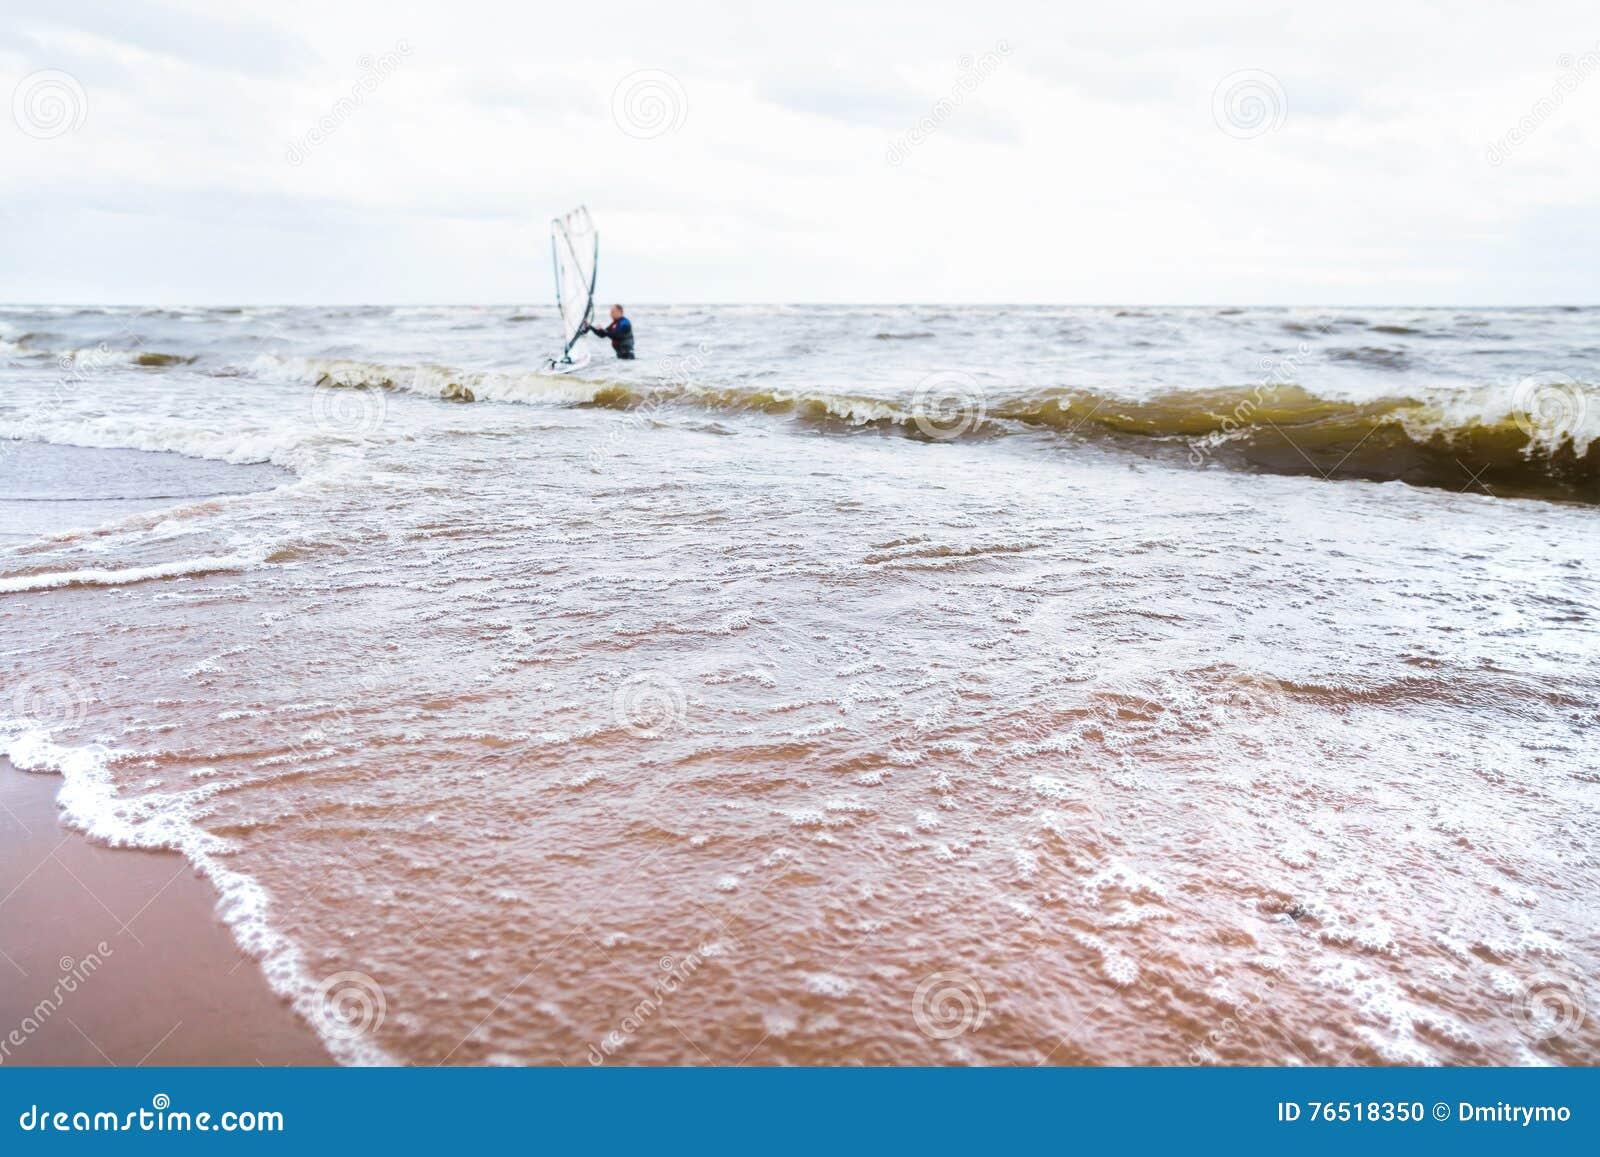 View of storm seascape. Windsurf board